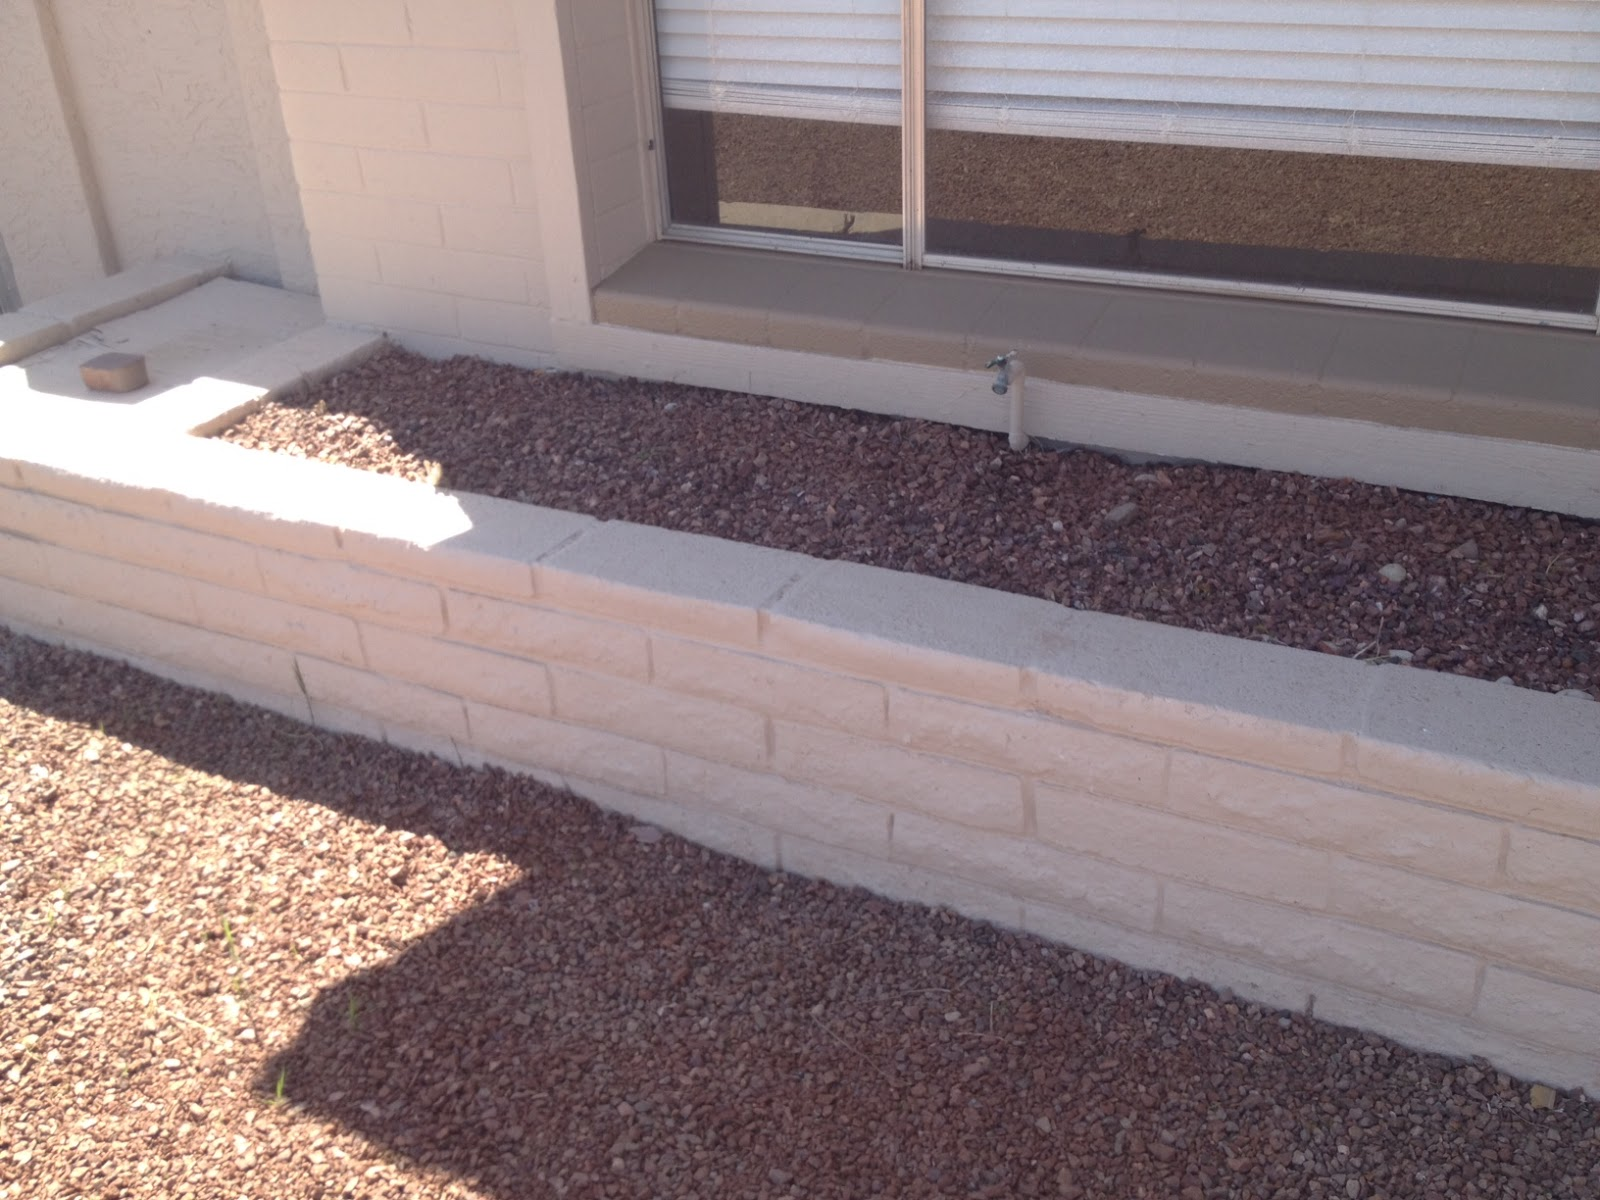 W.D.I.I.R. - The Arizona Termite Report: Faulty Grades, or ...